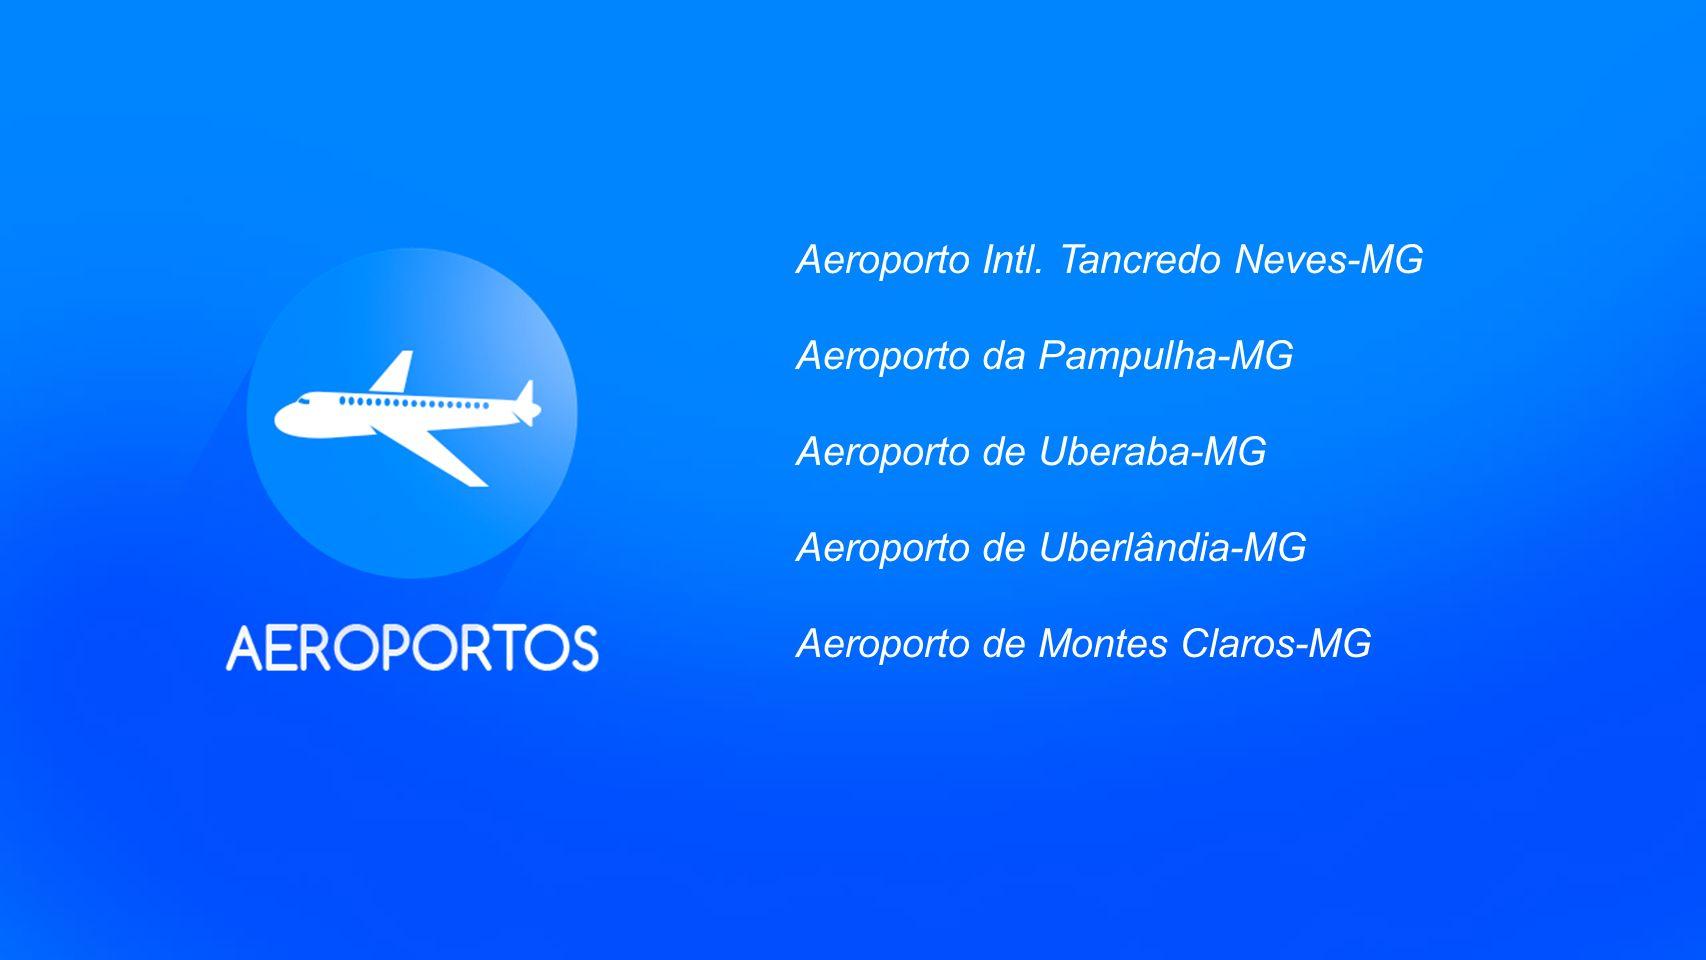 Aeroporto Intl. Tancredo Neves-MG Aeroporto da Pampulha-MG Aeroporto de Uberaba-MG Aeroporto de Uberlândia-MG Aeroporto de Montes Claros-MG